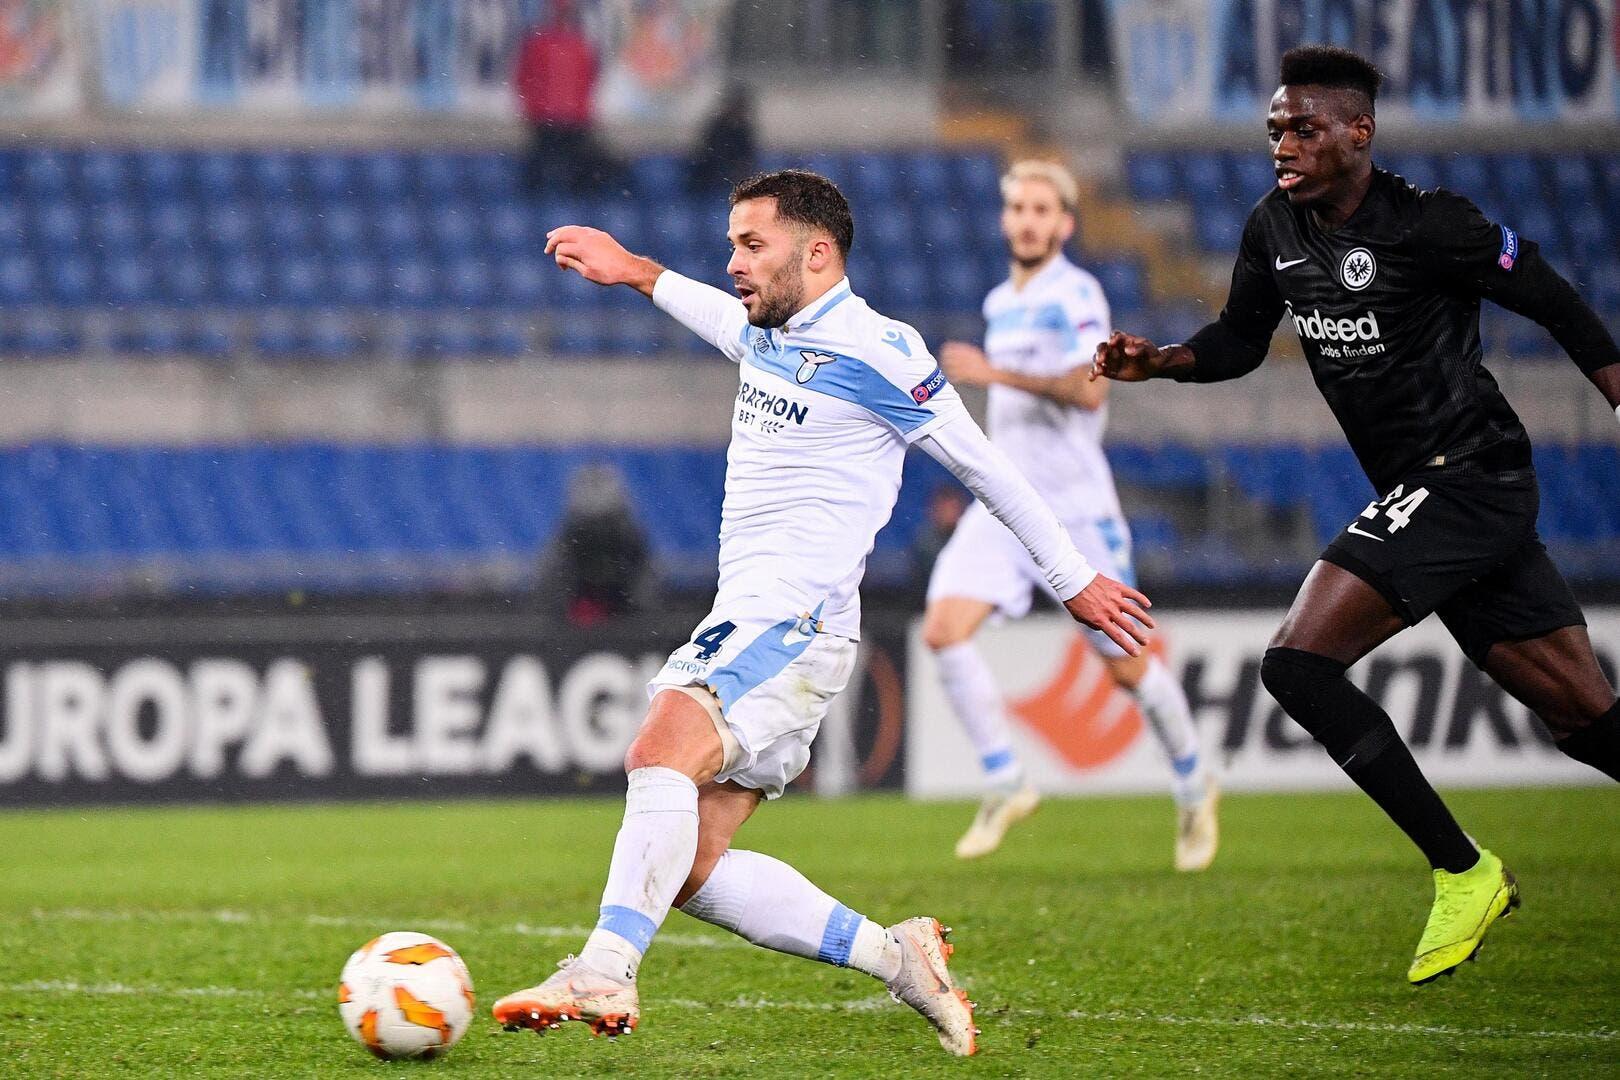 Officiel : Accord avec la Lazio, Nice tient sa première recrue